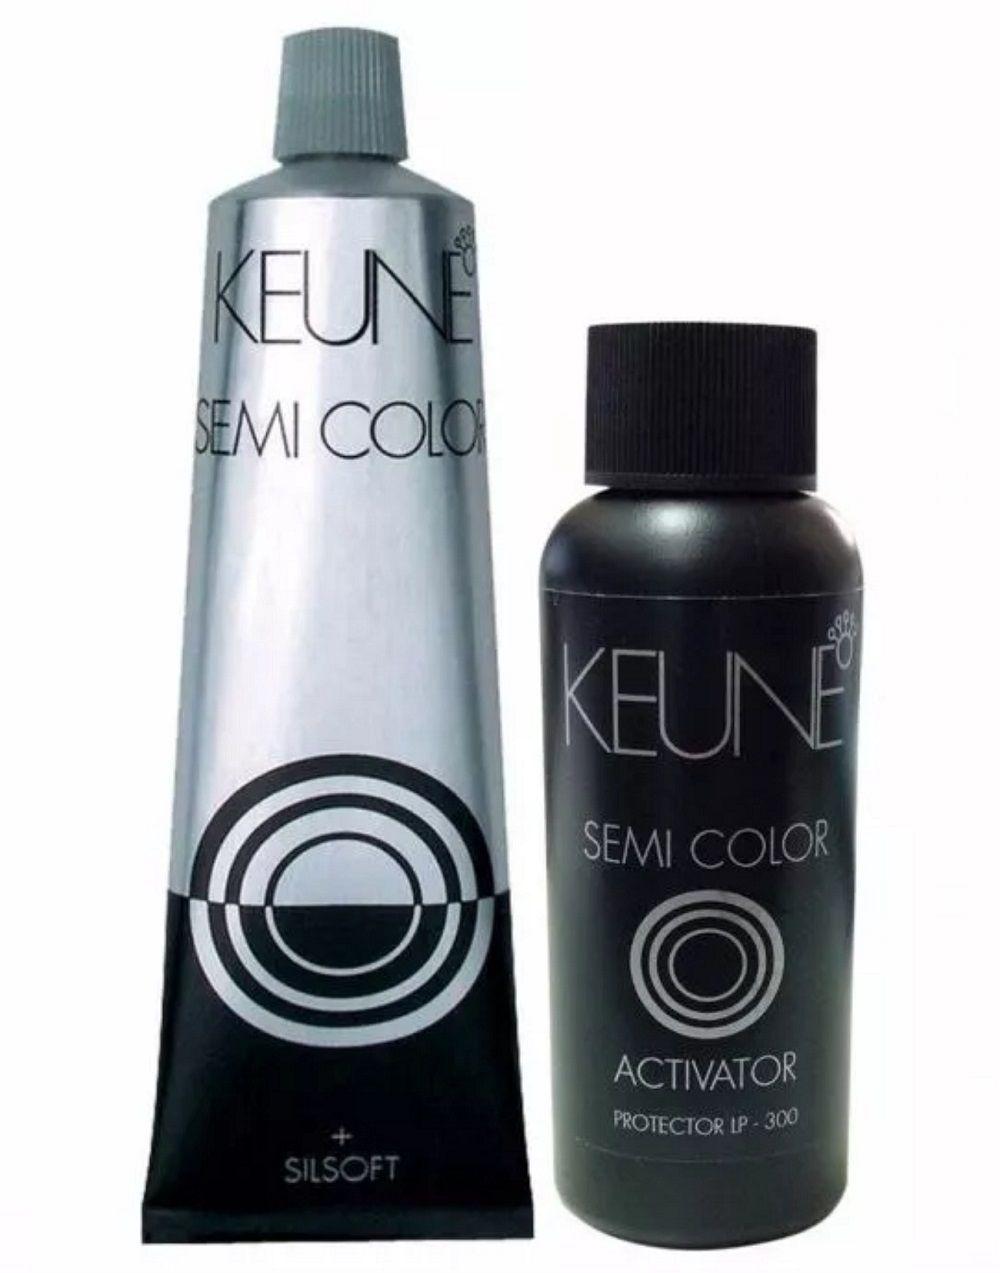 Kit Keune Tonalizante 60ml - Cor 10.7 - Louro Extra Claro Violeta + Ativador 60ml